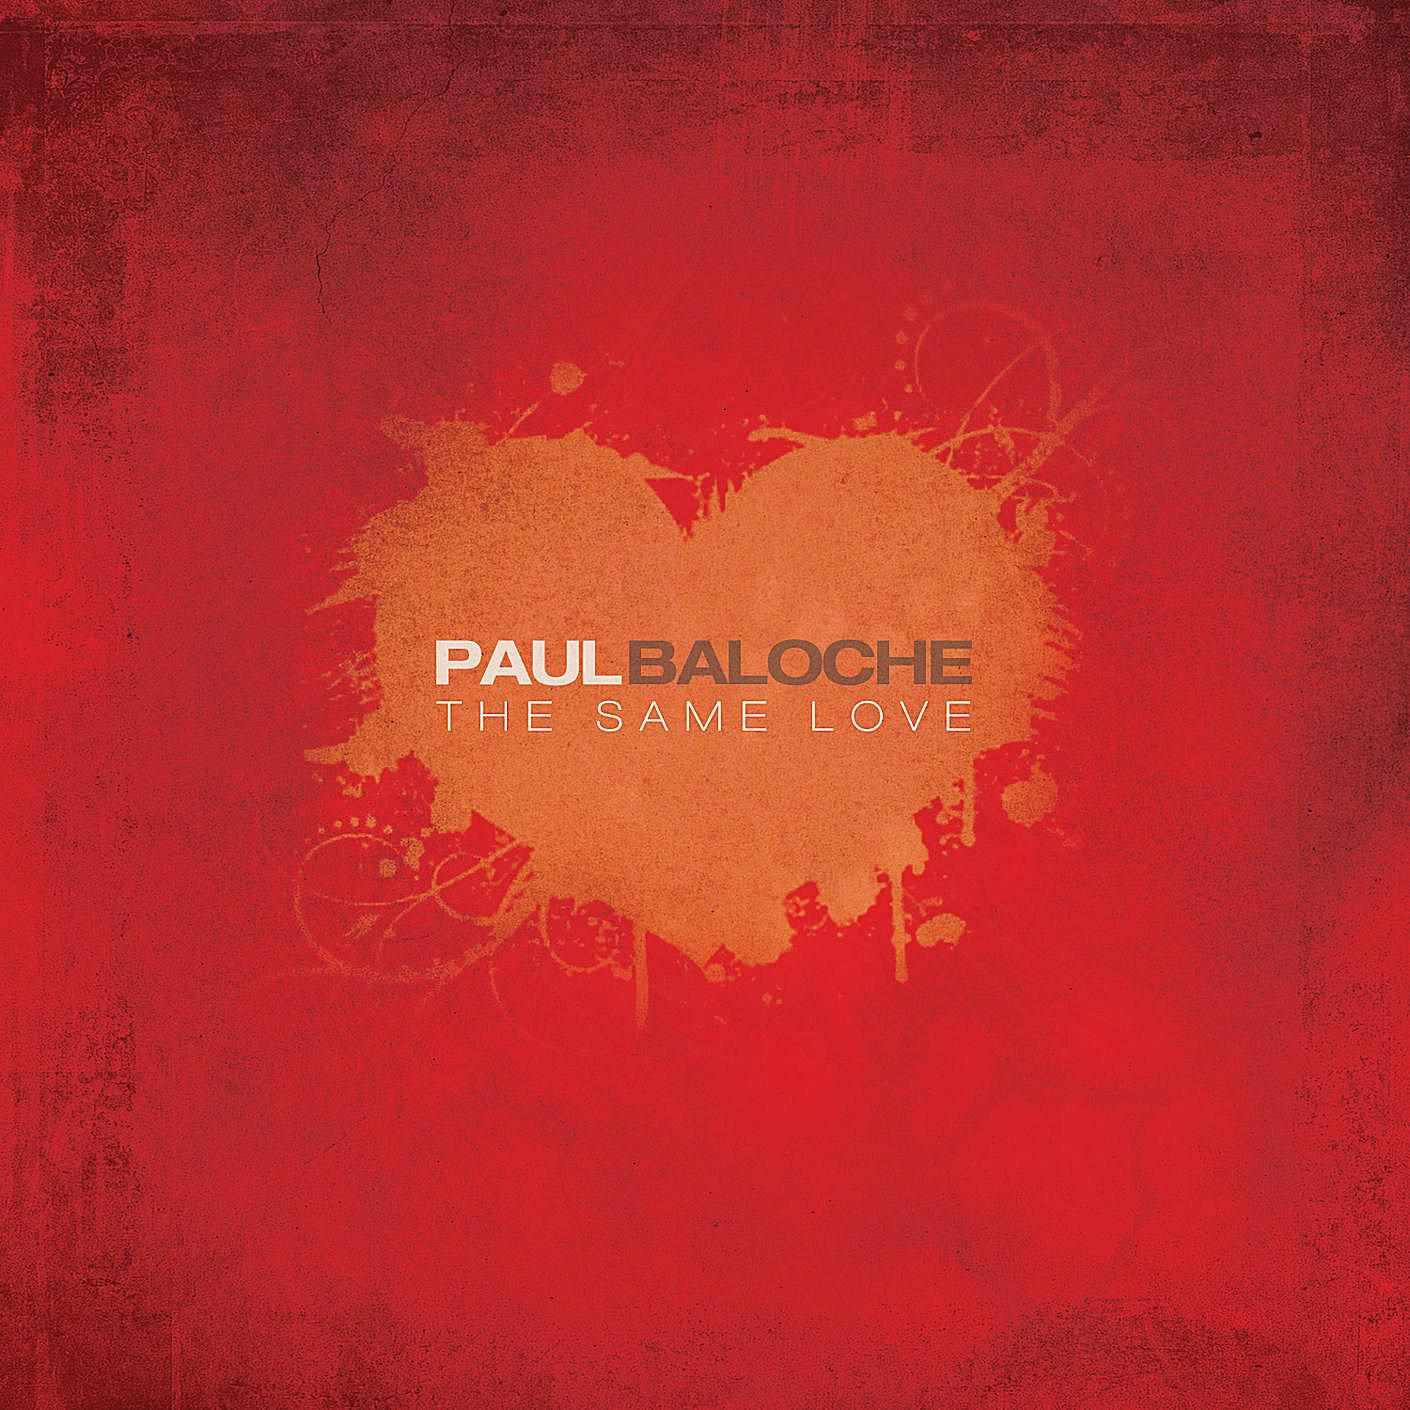 Paul Baloche - The Same Love